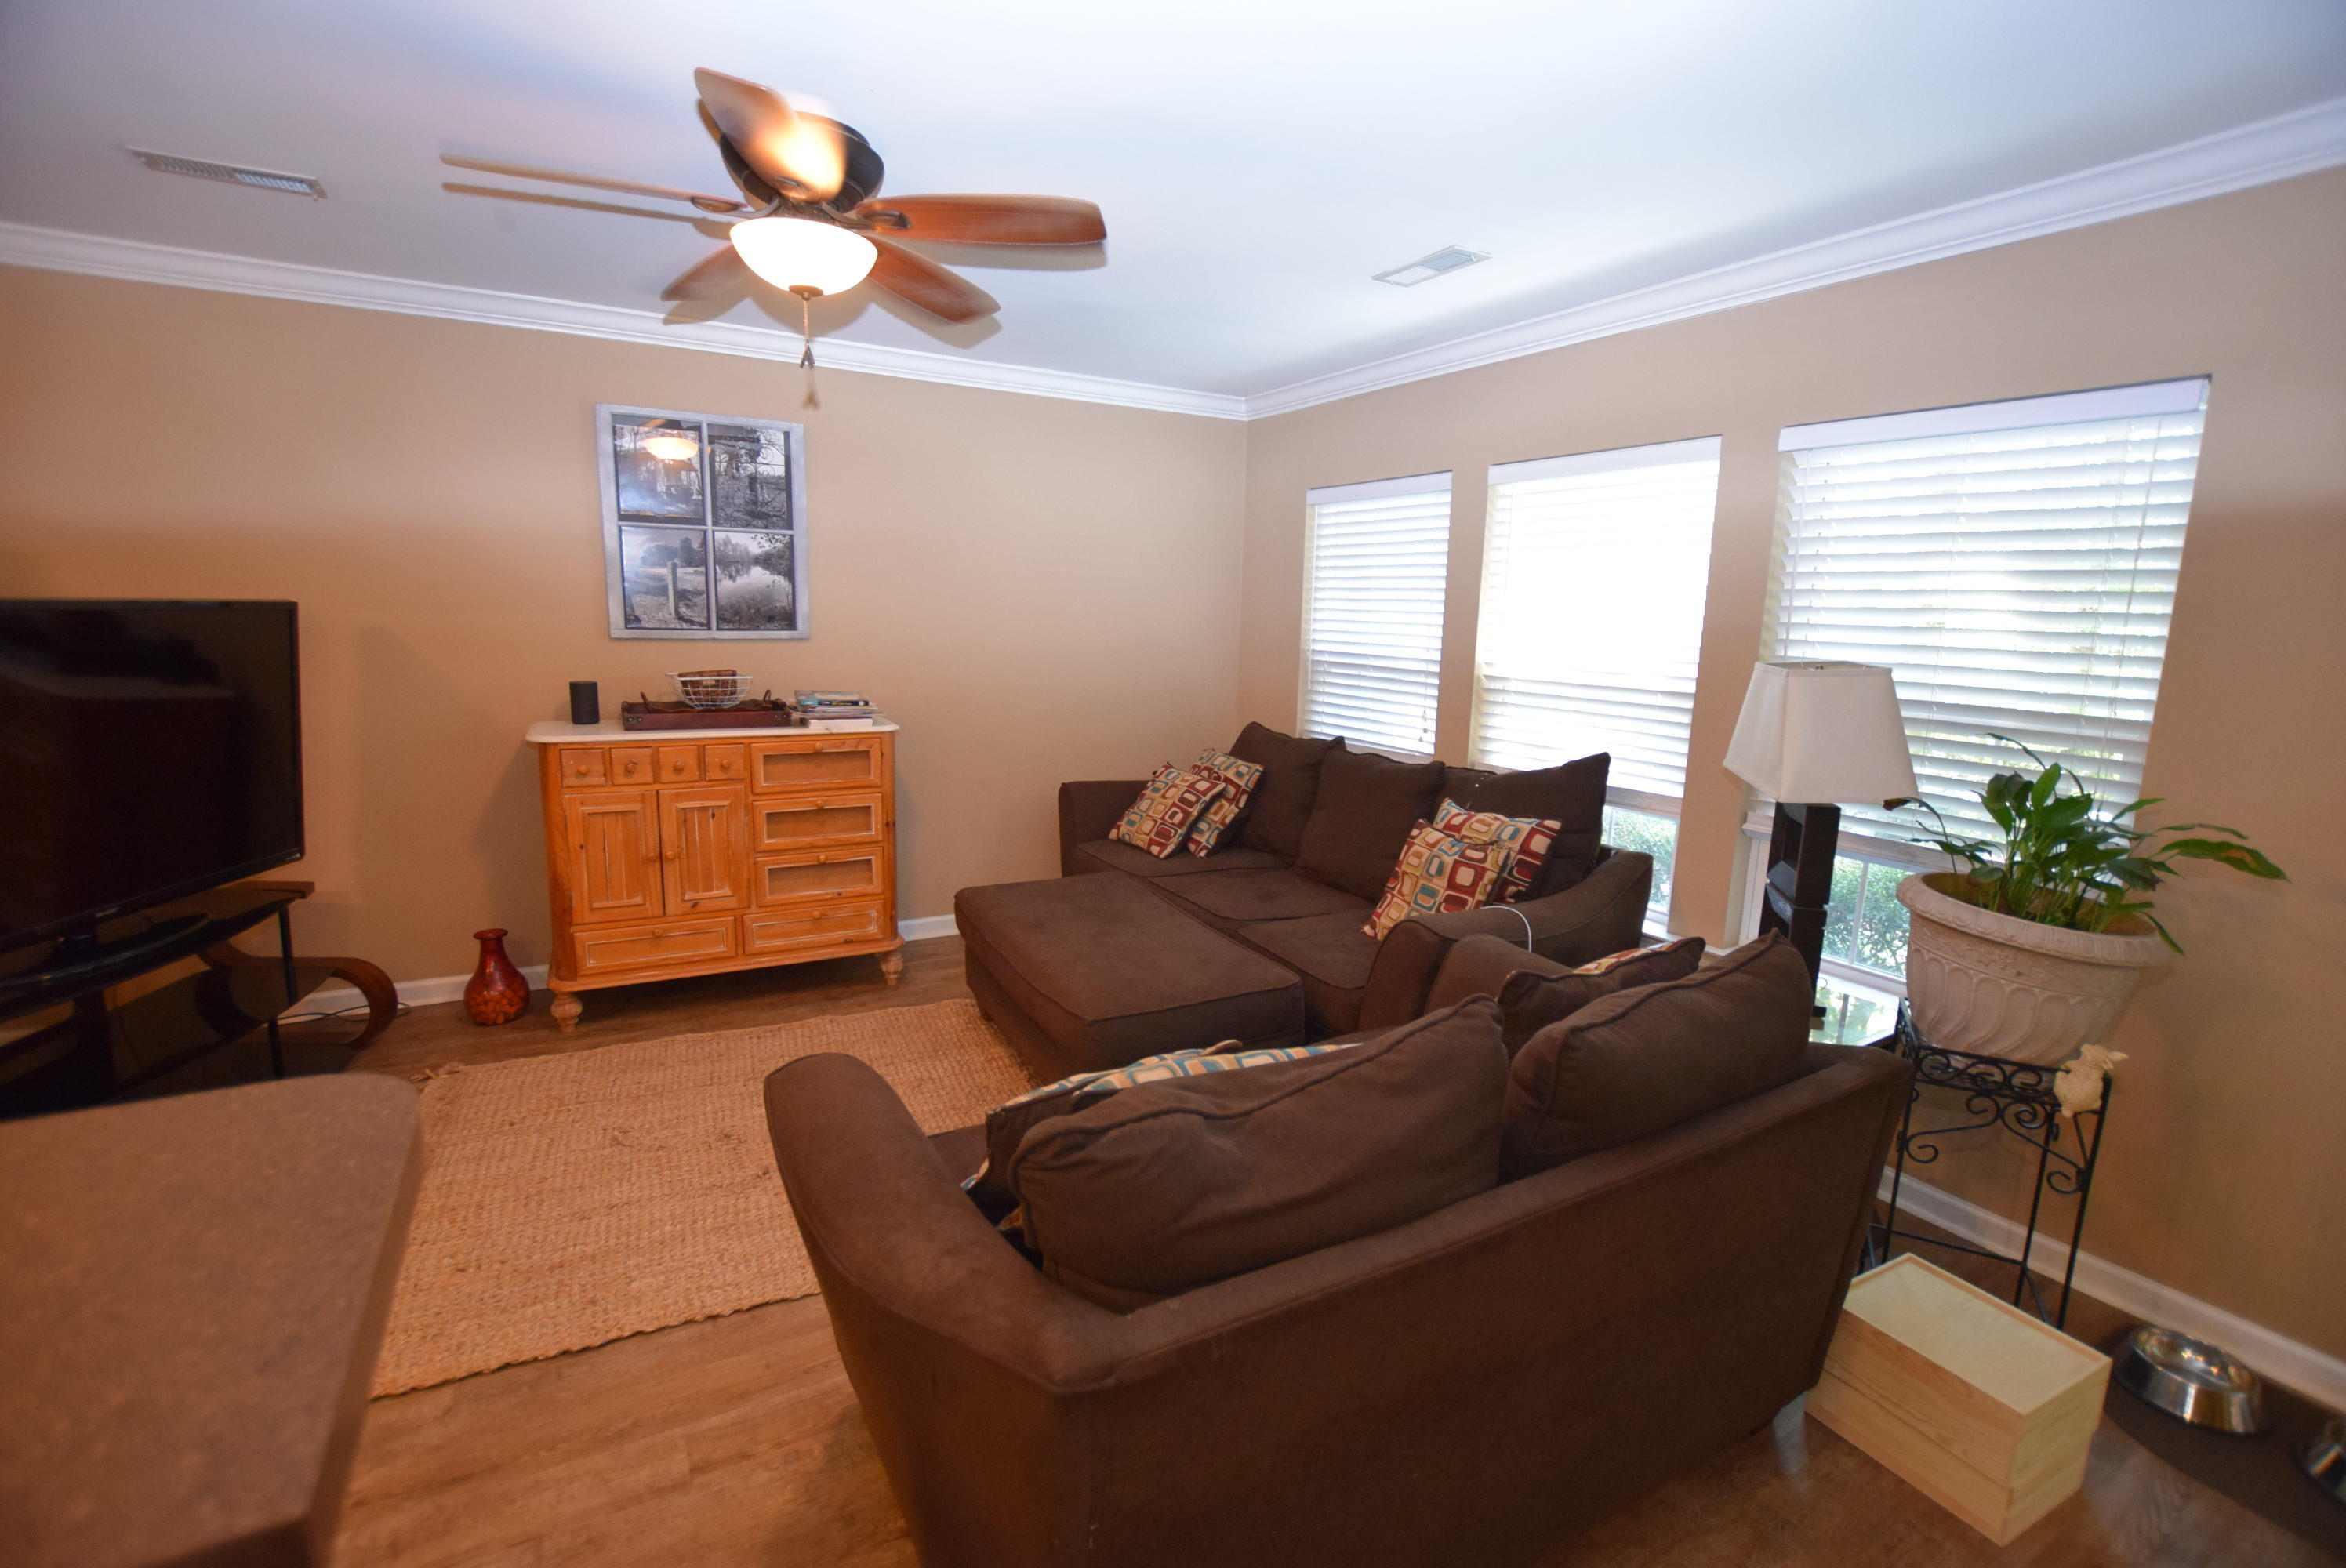 Charleston Park Homes For Sale - 5150 Trump, North Charleston, SC - 10